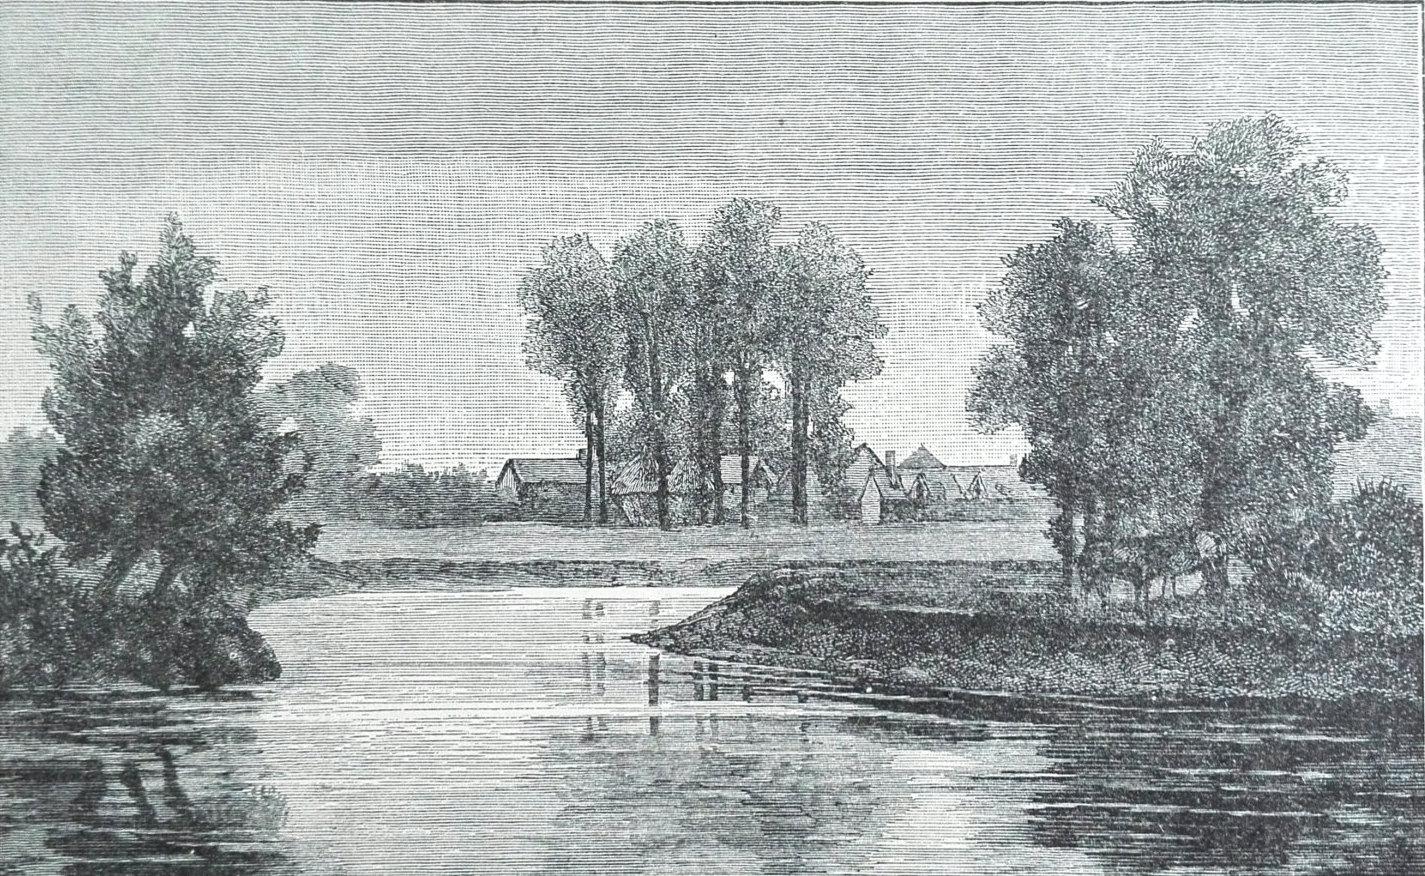 Sutton Weir Victorian print calm river art vintage black and white mounted antique